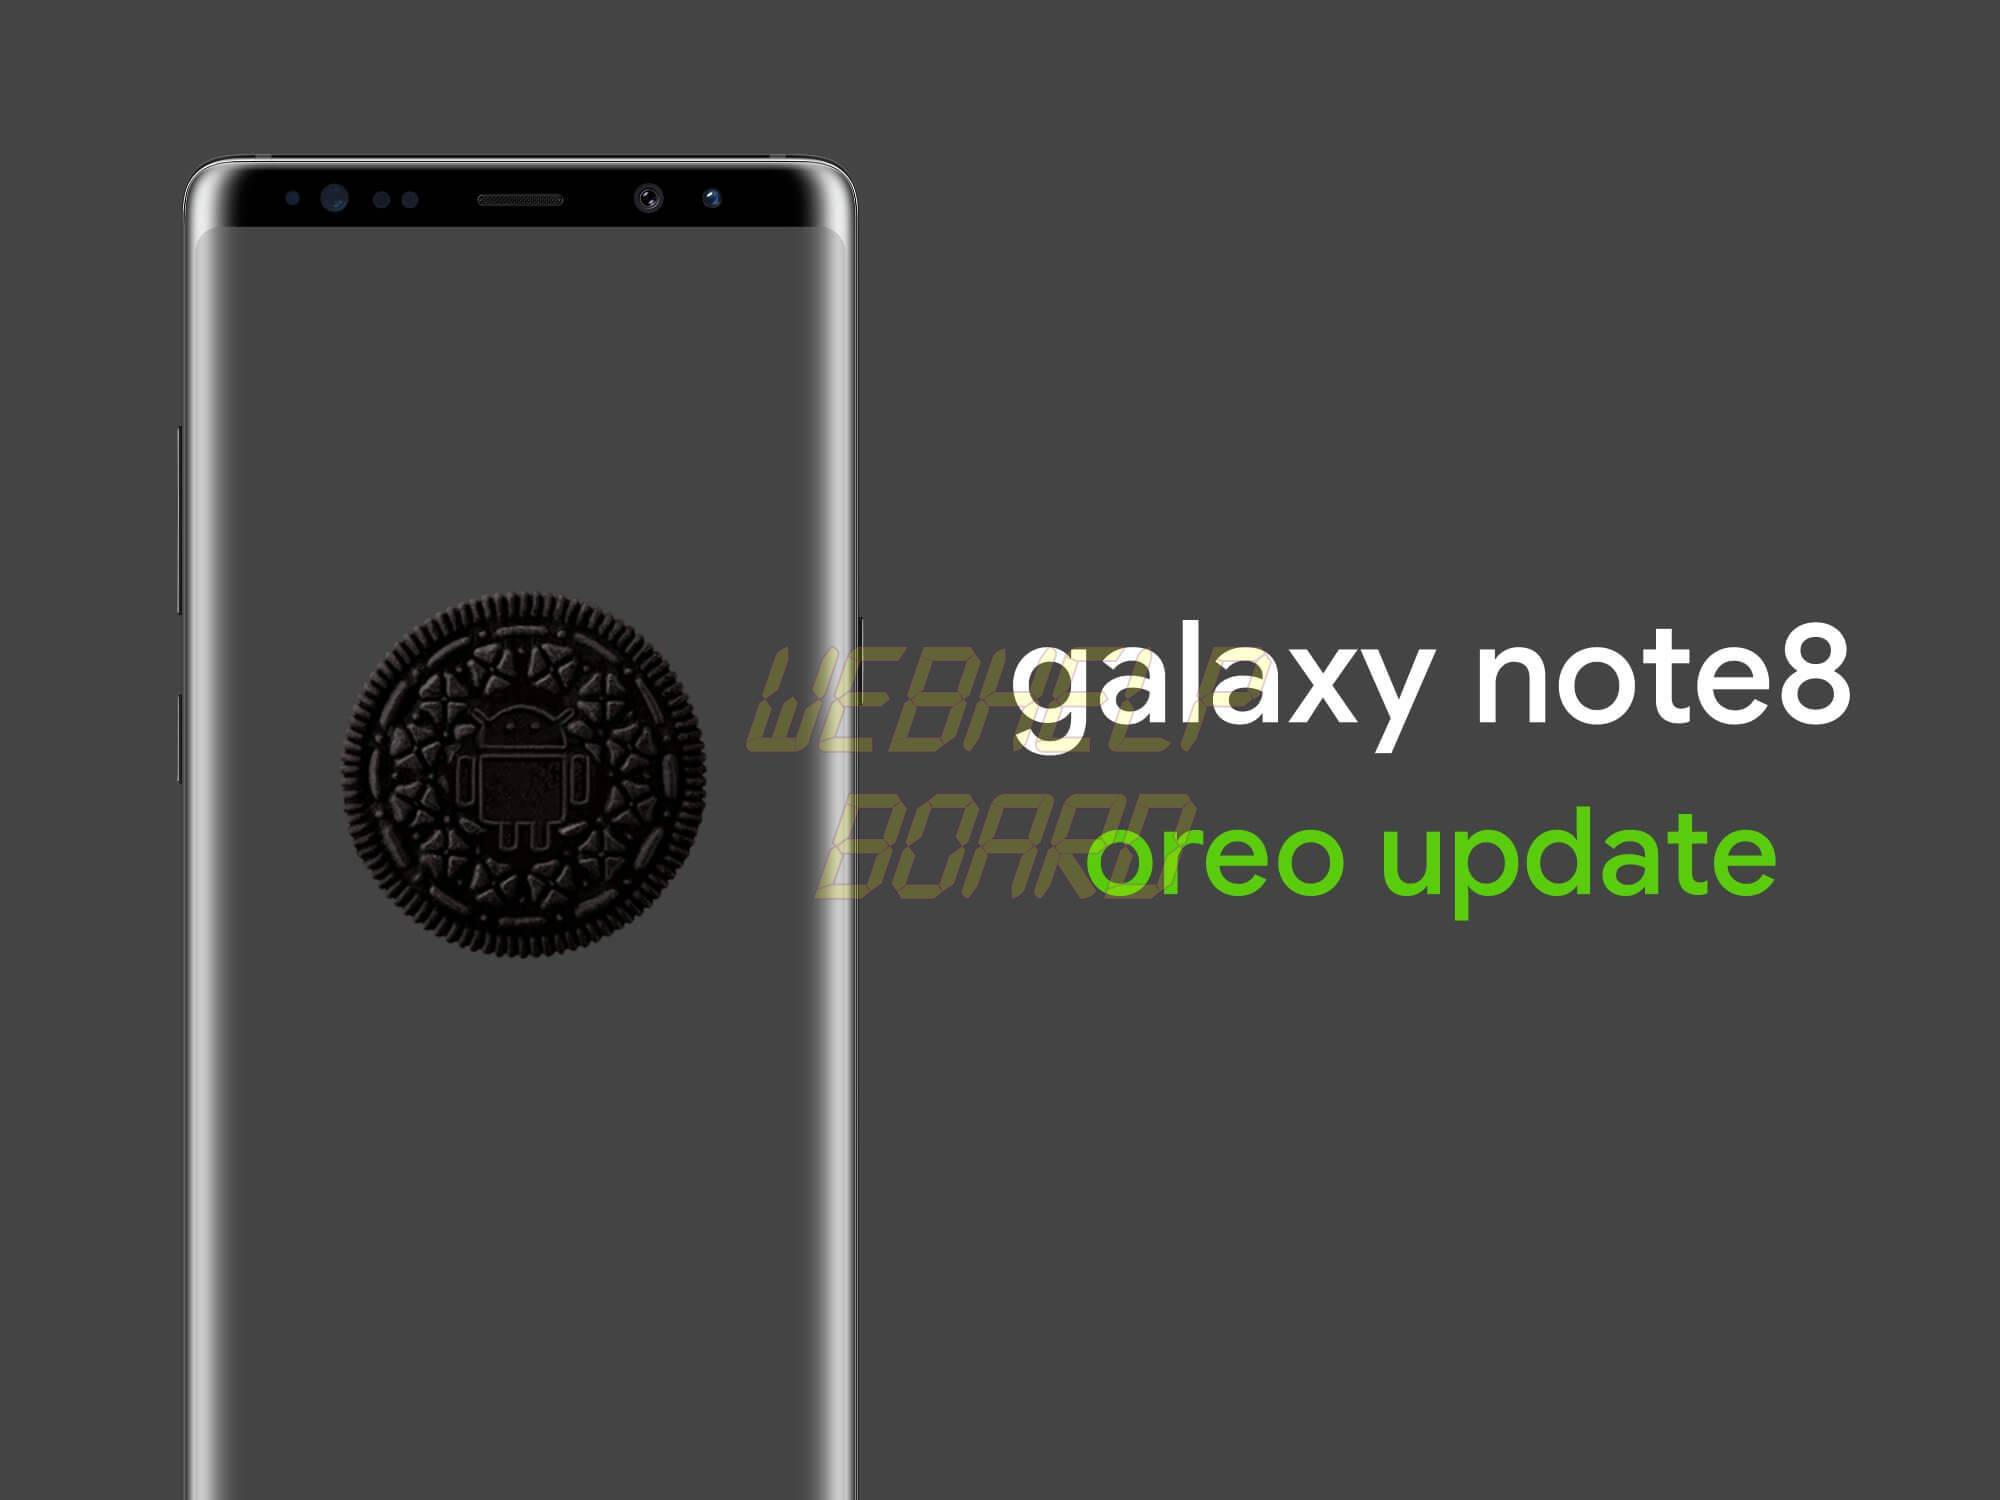 Galaxy Note8 Oreo update - Tutorial: como instalar o Android Oreo 8.0 no Galaxy Note 8